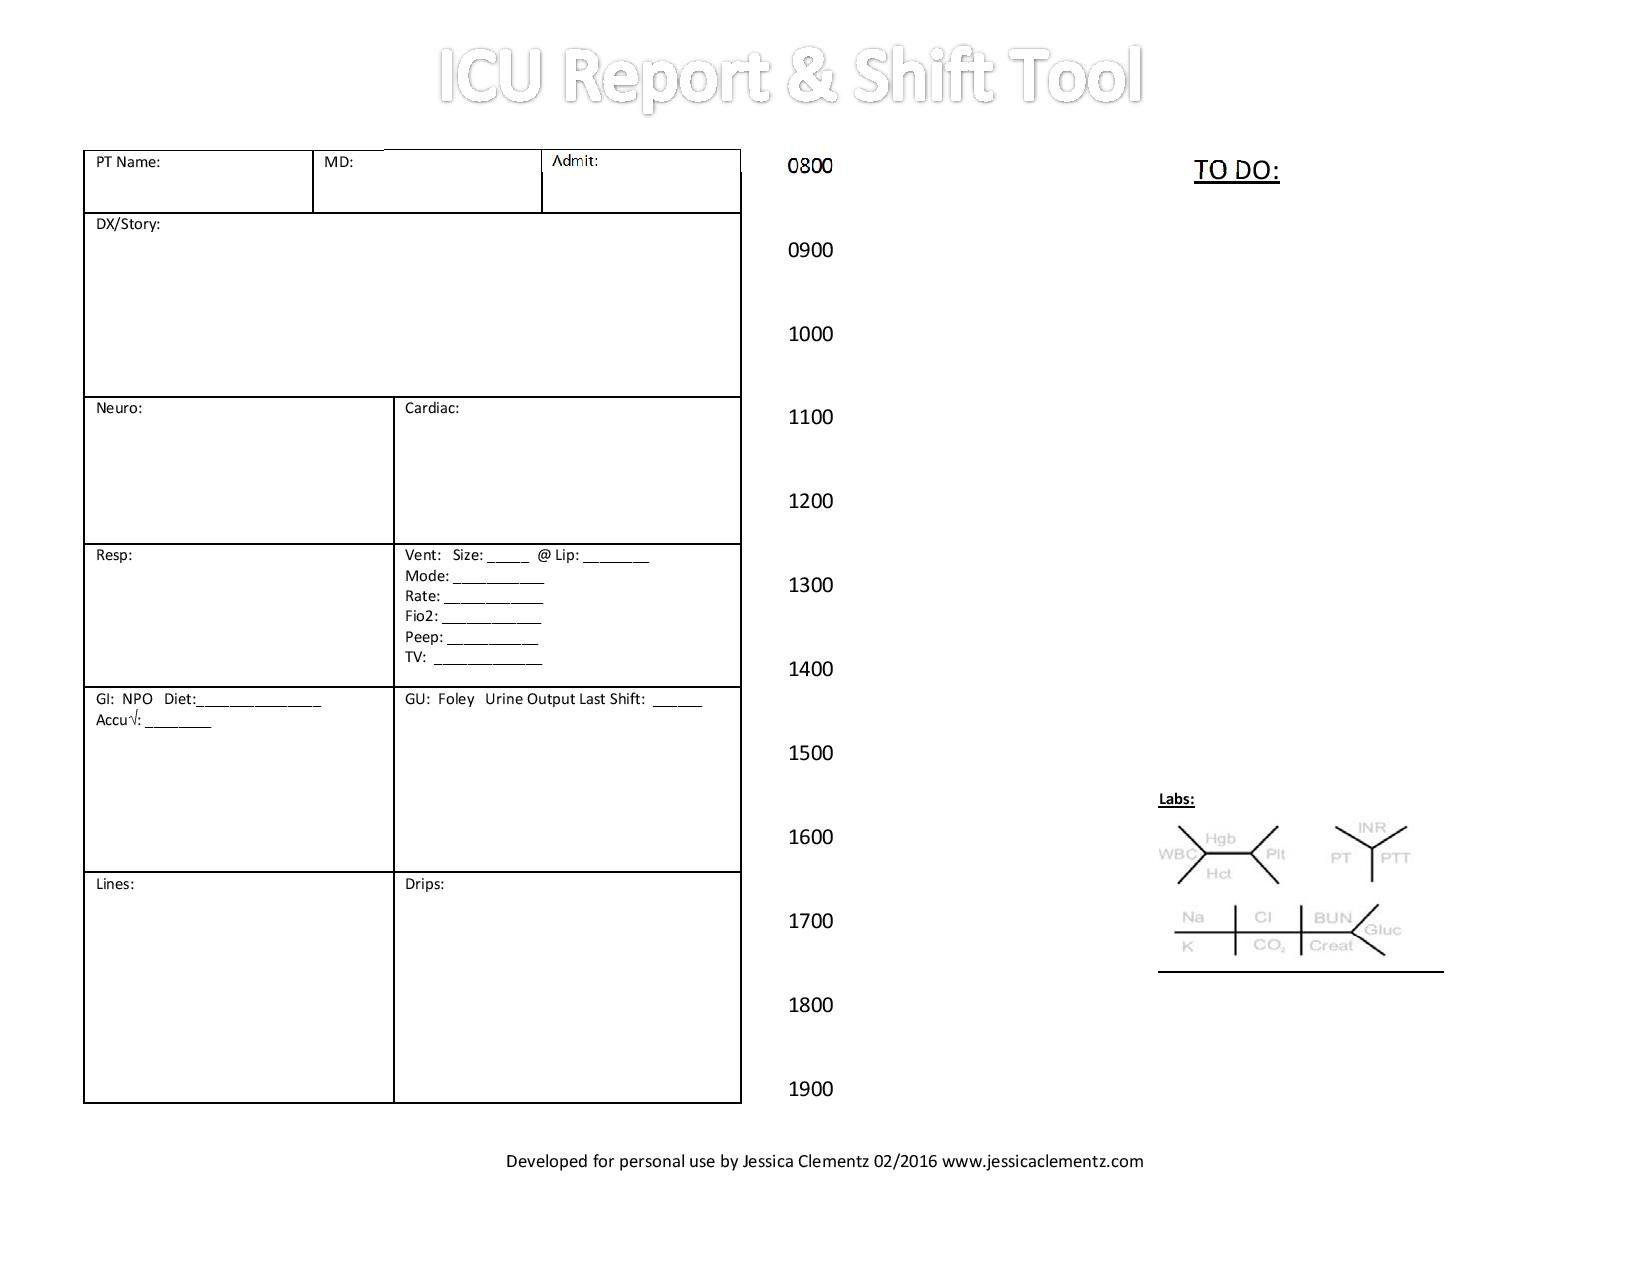 Nurse brain sheet icu report and shift tool nursing